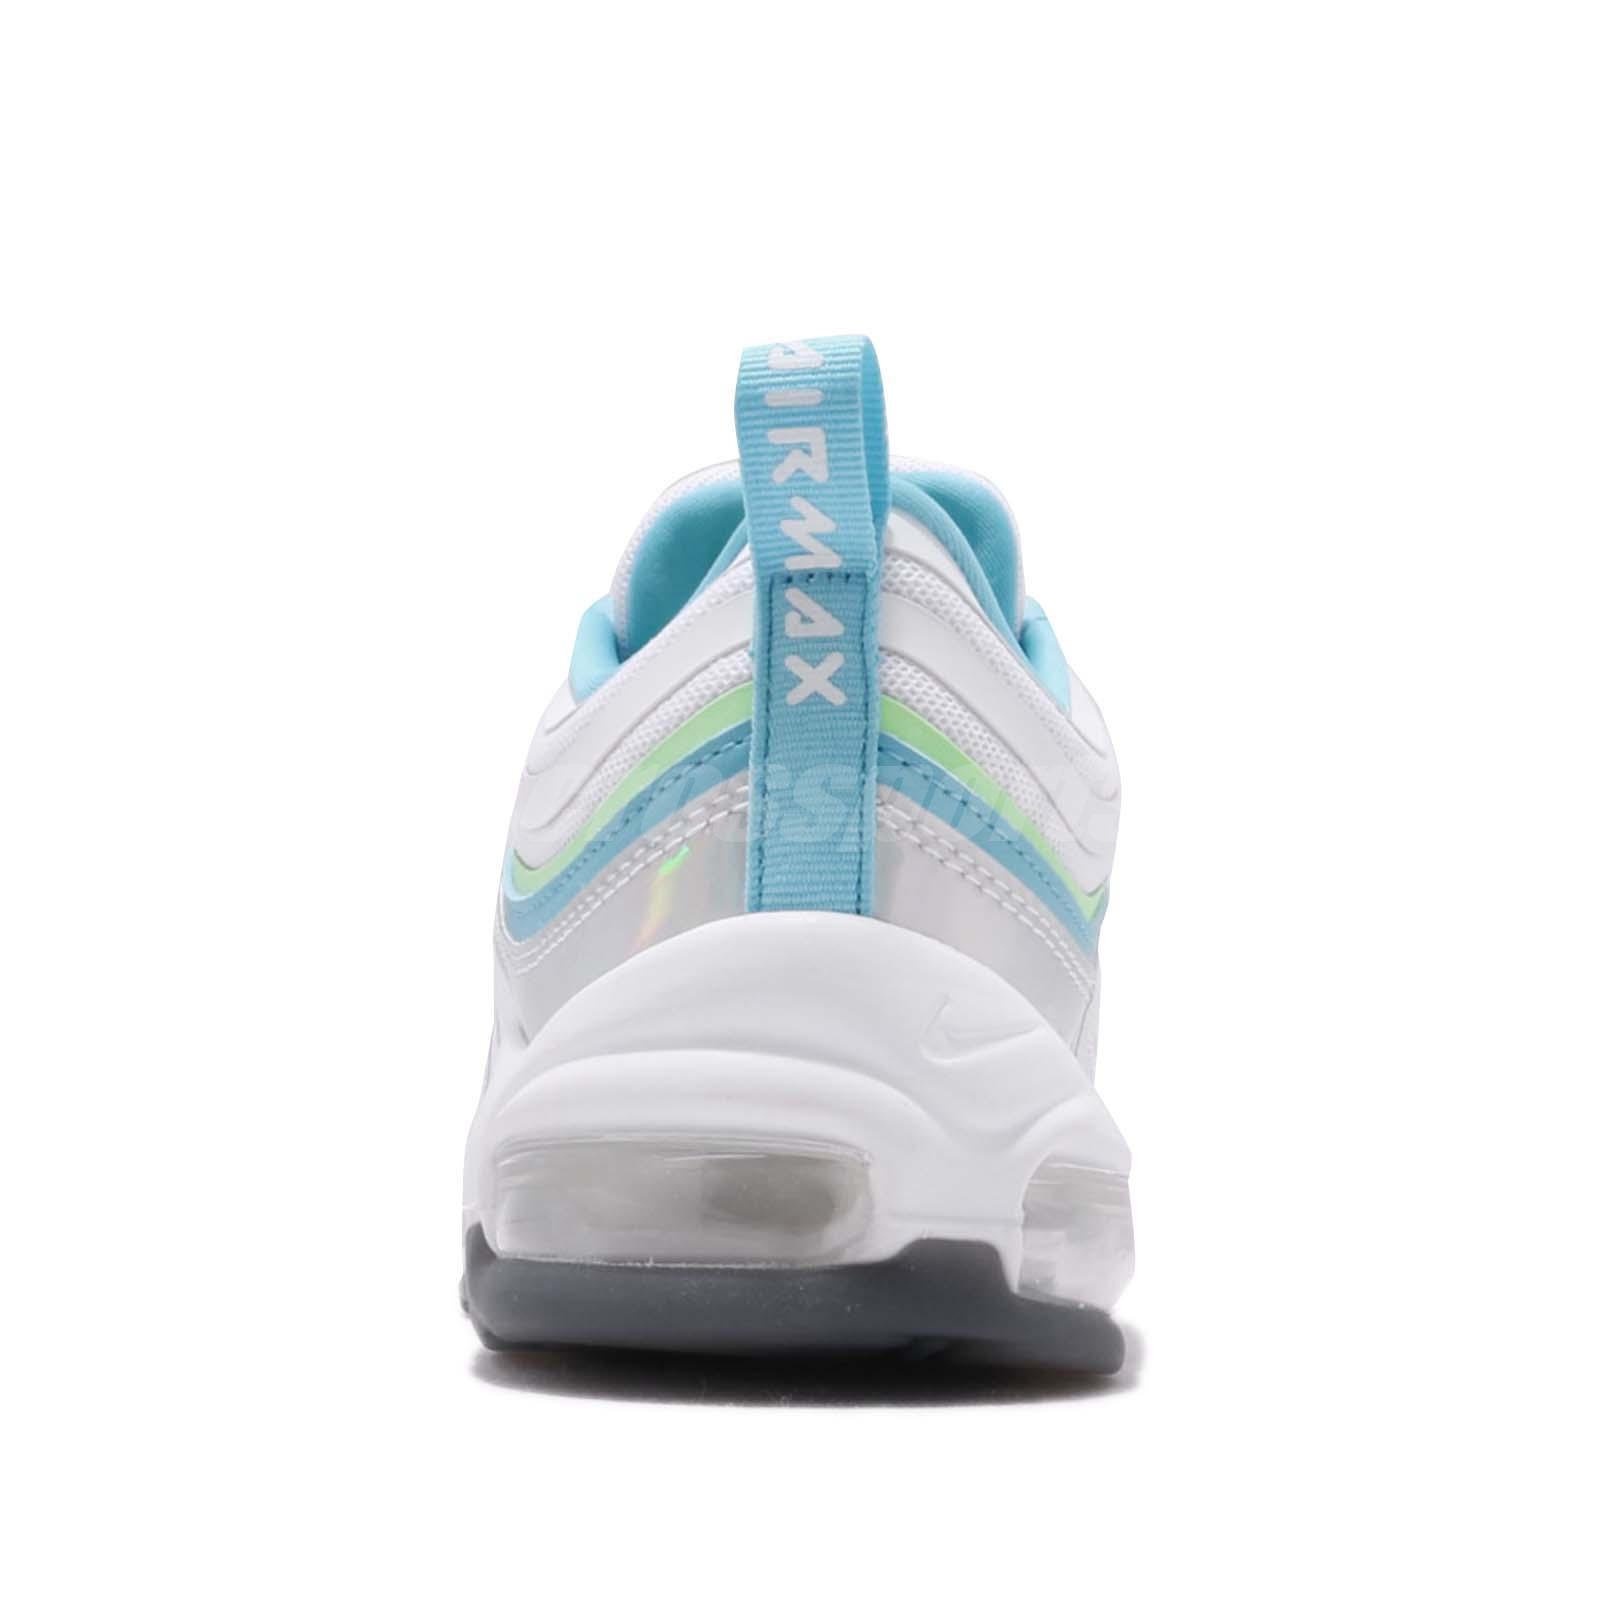 Nike Wmns Air Max 97 Ul 17 Se White Hologram Blue Women